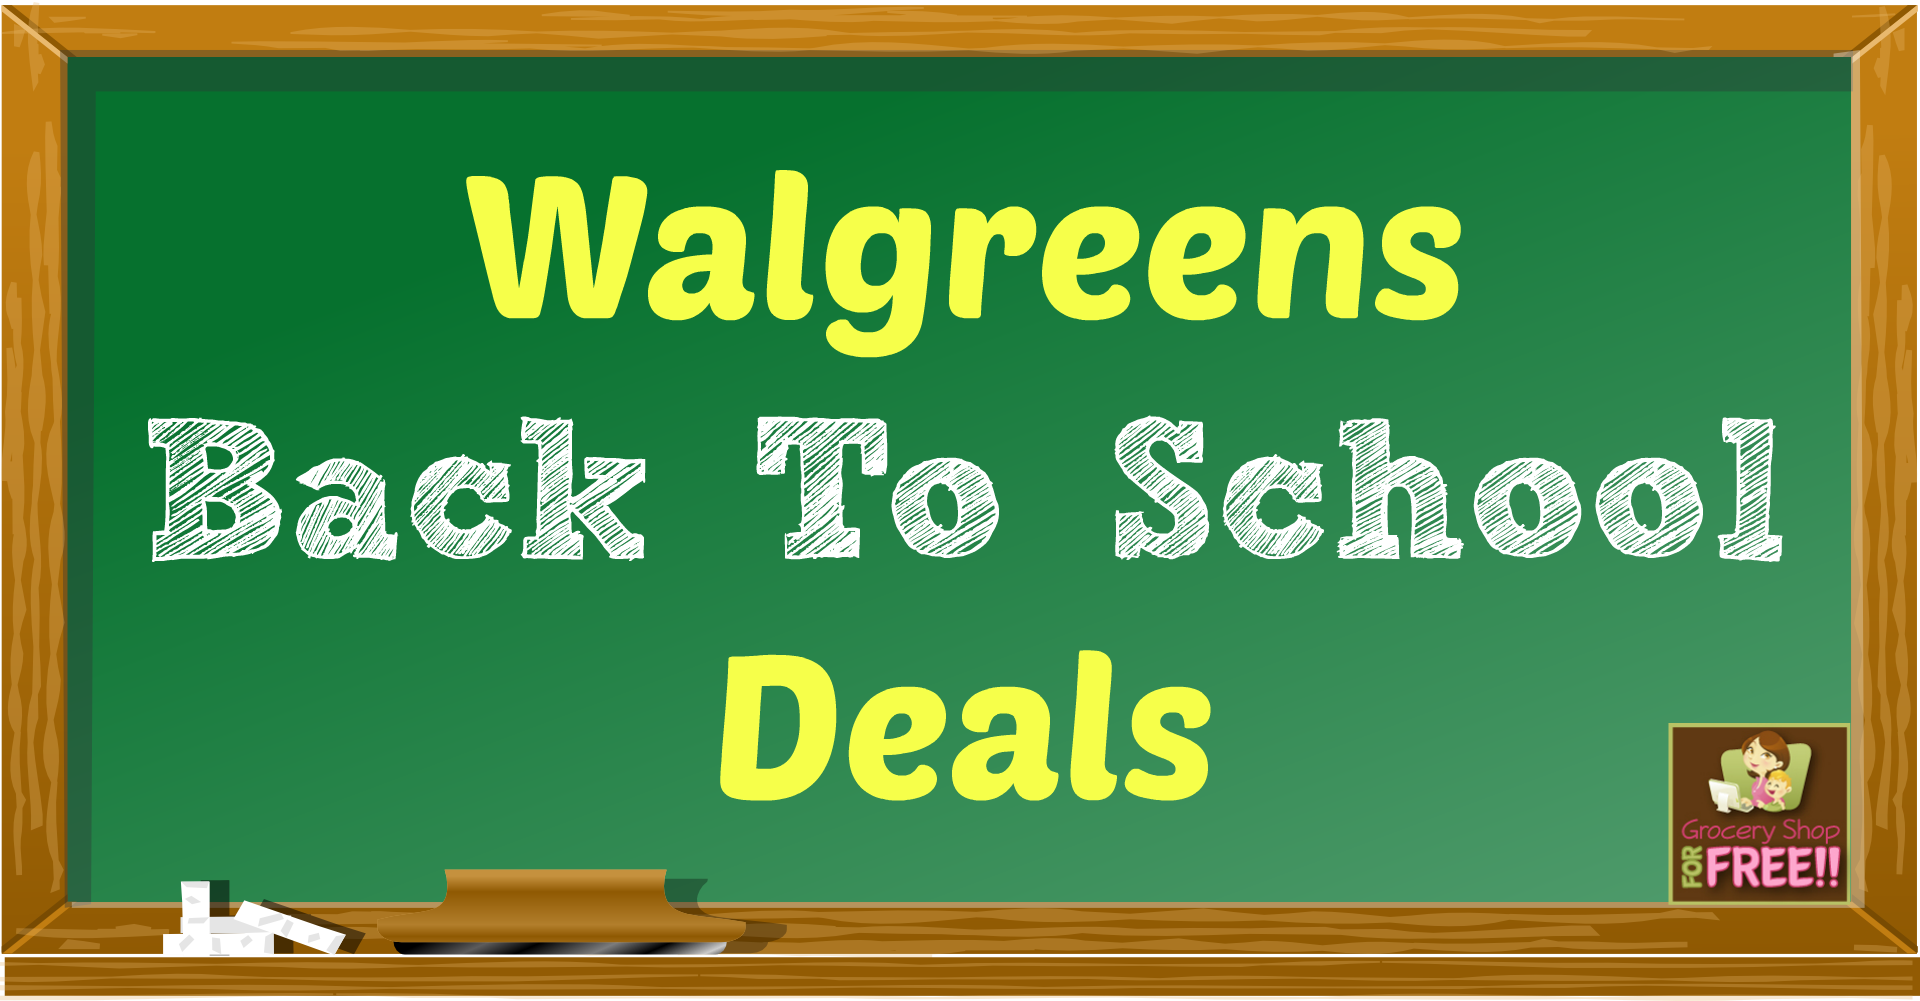 Walgreens Back To School ofertas! Back to school deals